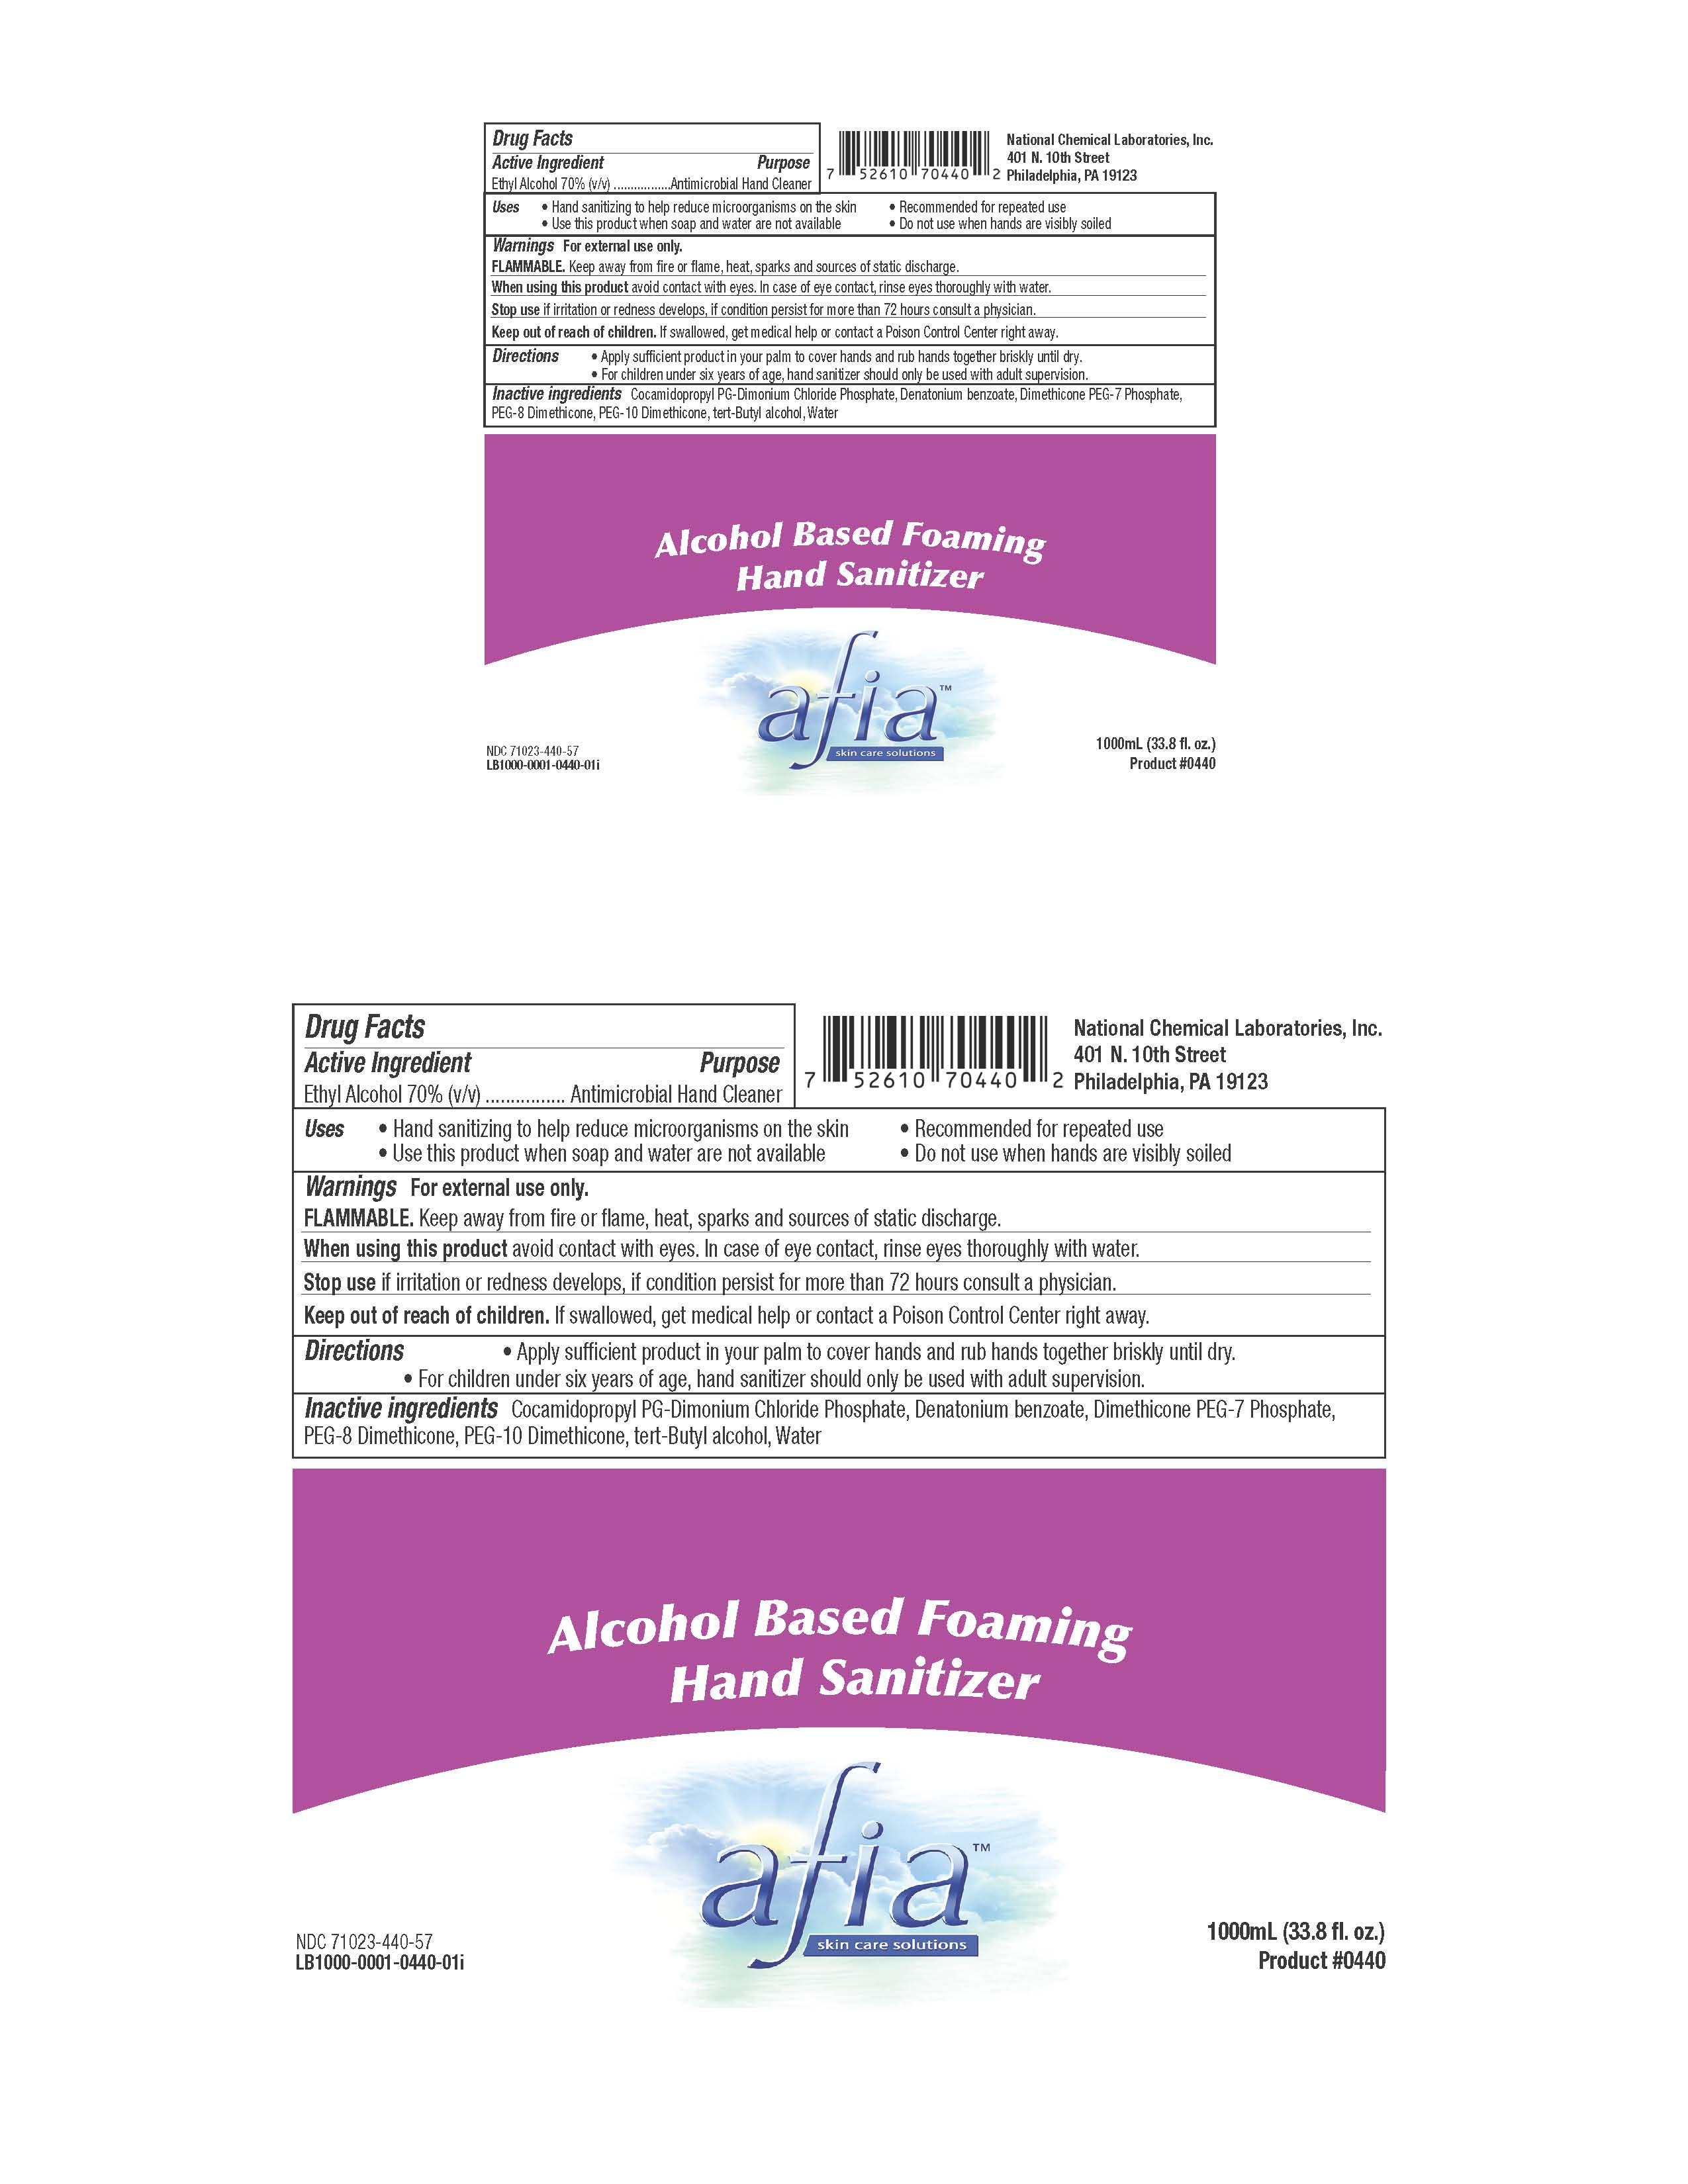 Labeling Information